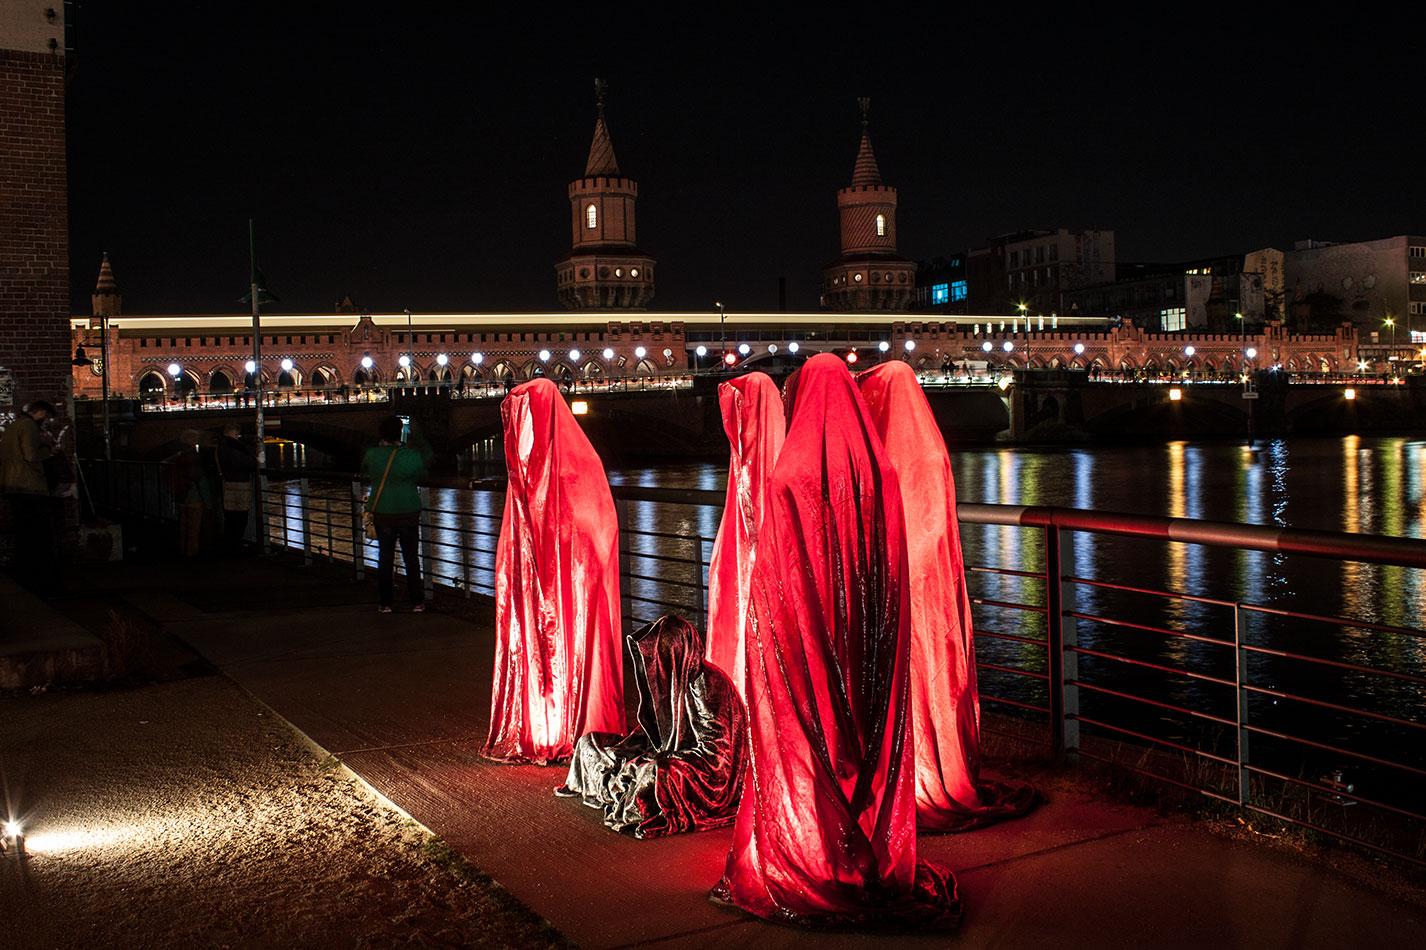 25-years-wallfall-berlin-germany-east-side-gallery-contemporary-fine-art-show-arts-design-guardians-of-time-manfred-kili-kielnhofer-4504